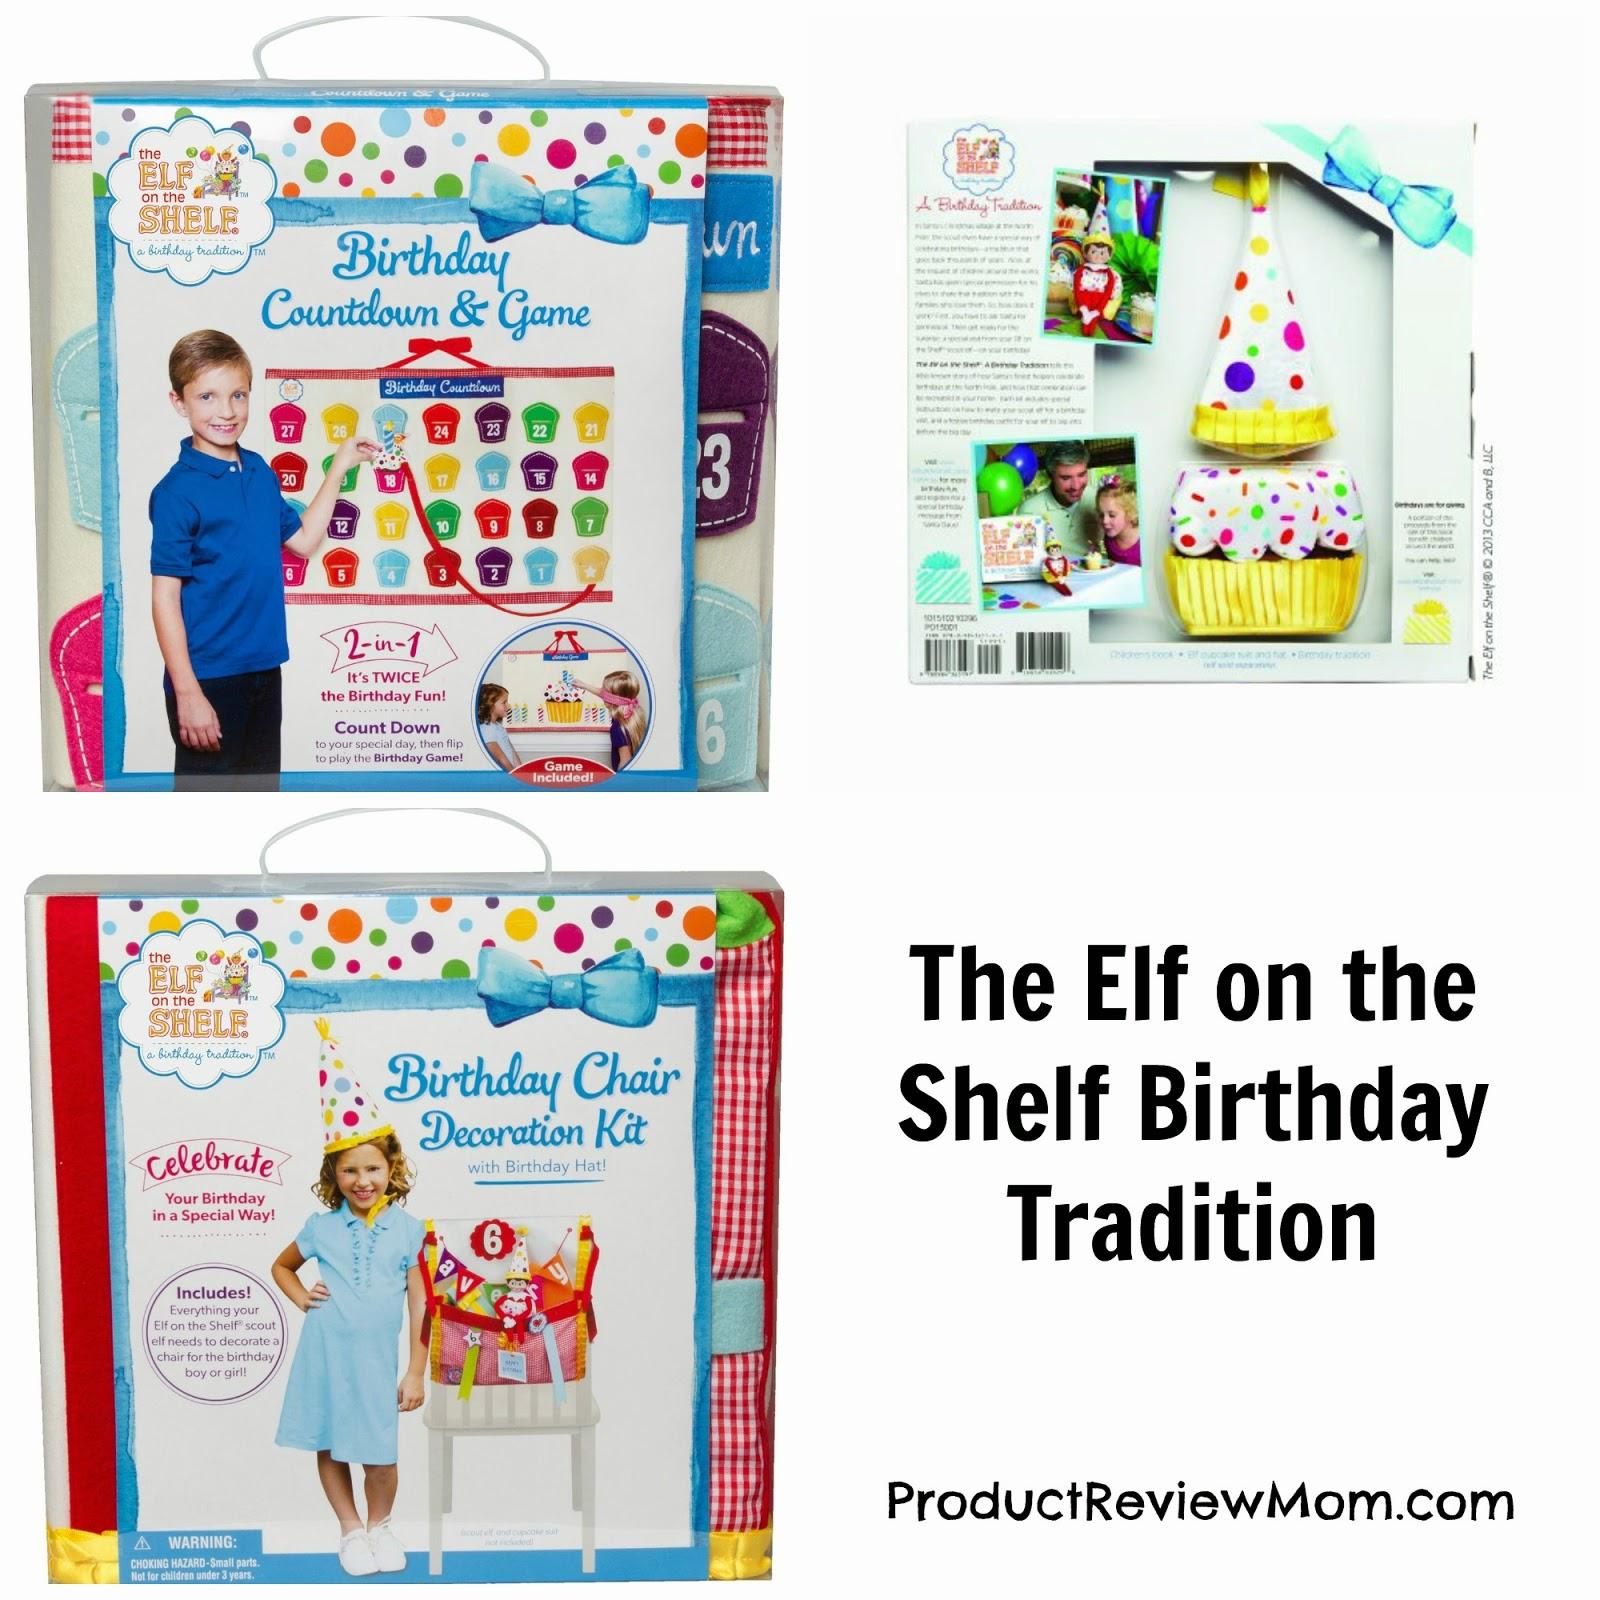 Elf on the Shelf Birthday Day Party Event Recap #ElfBirthday via www.Productreviewmom.com